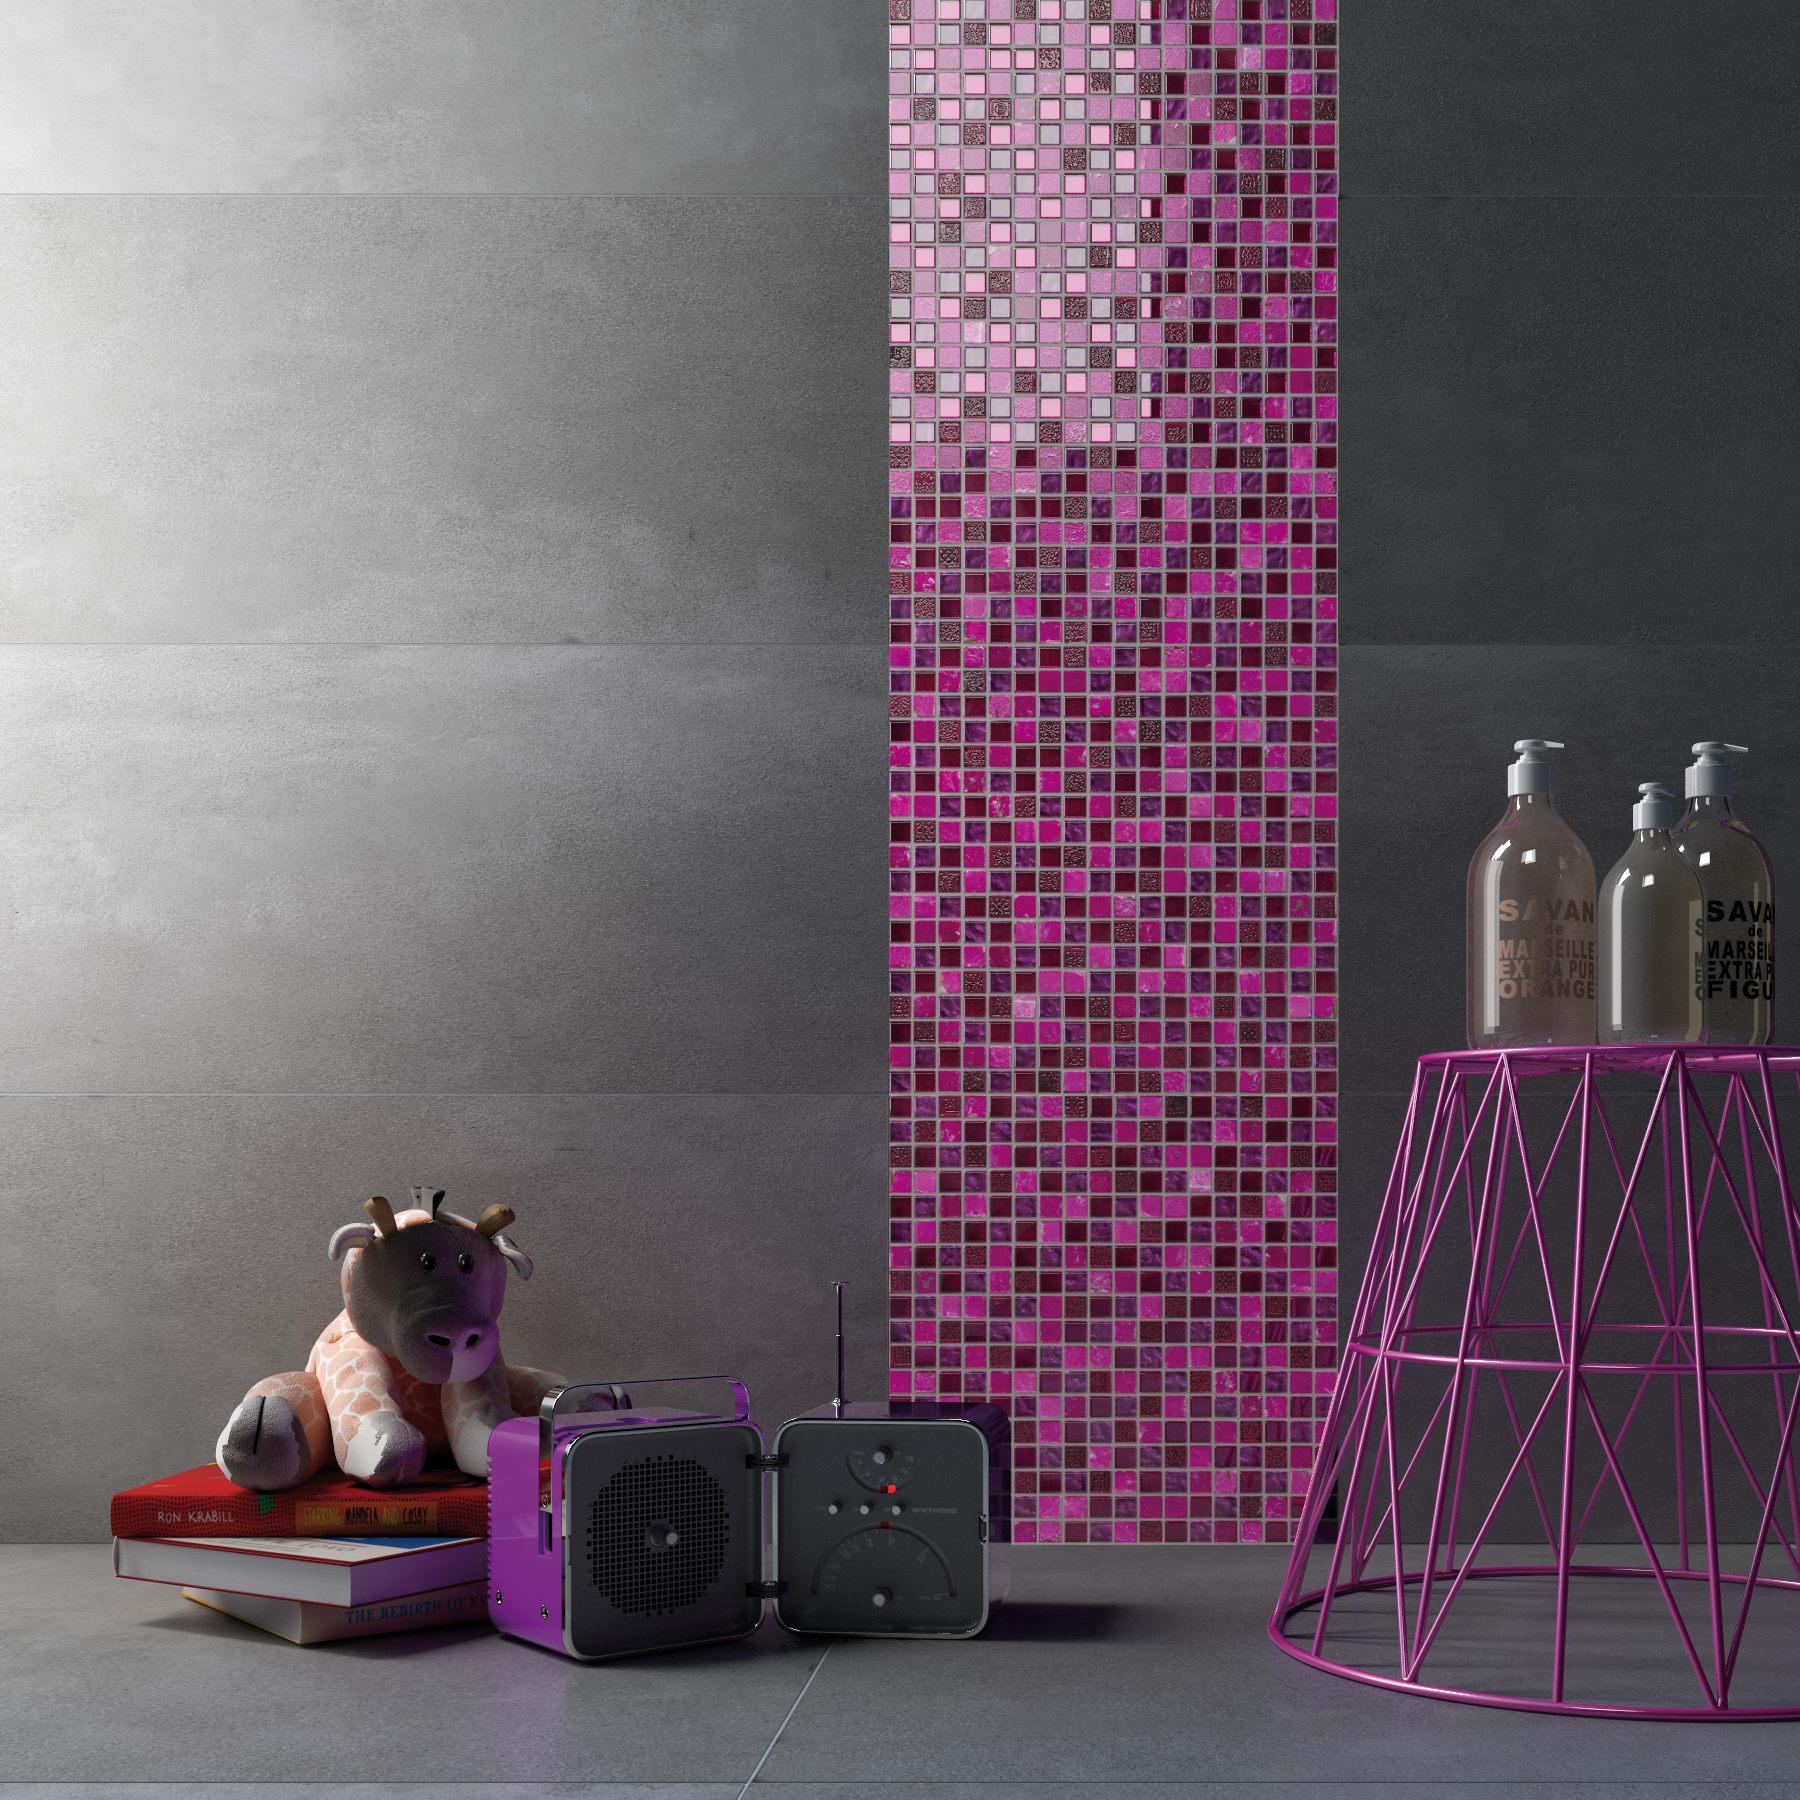 Piastrelle Bagno Mosaico Viola mosaico fucsia glit h 30 x l 30 cm rosa